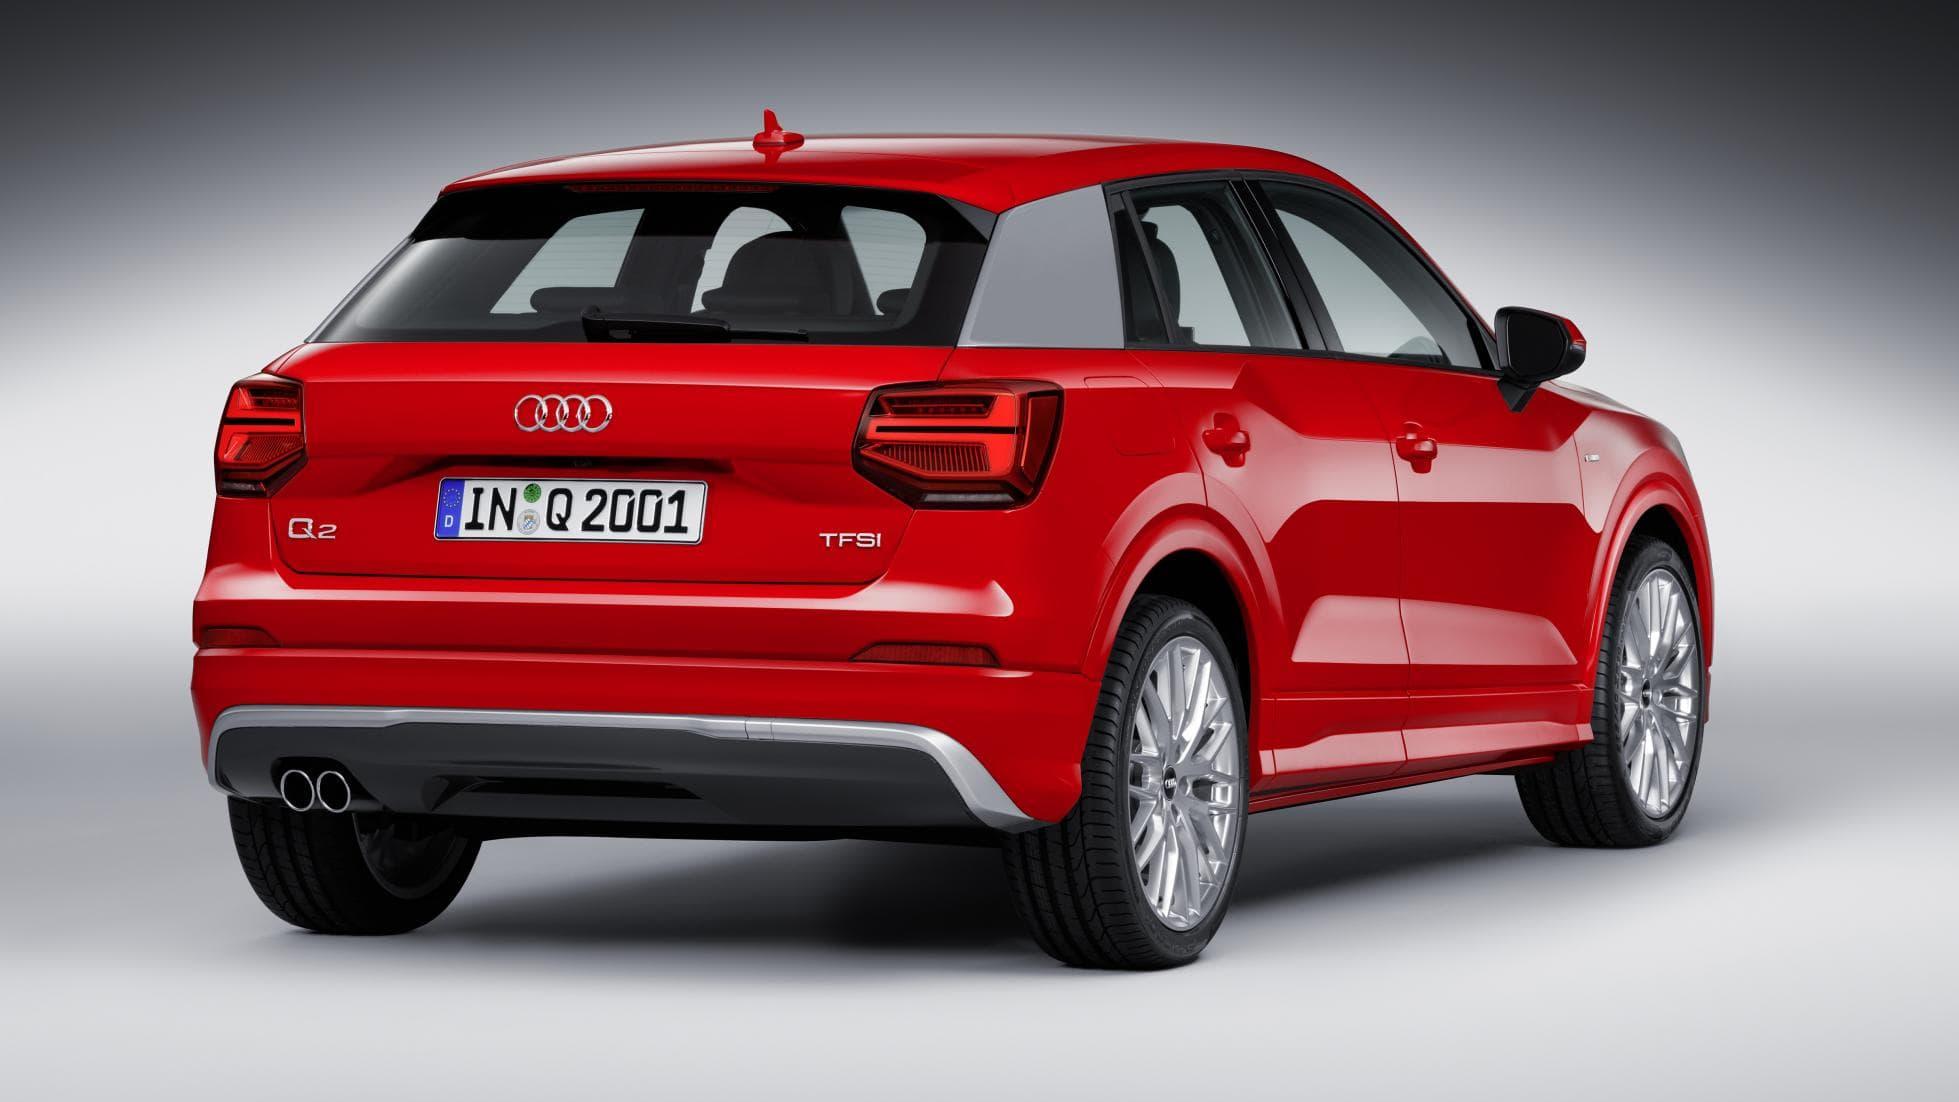 Audi Q2 Wallpaper